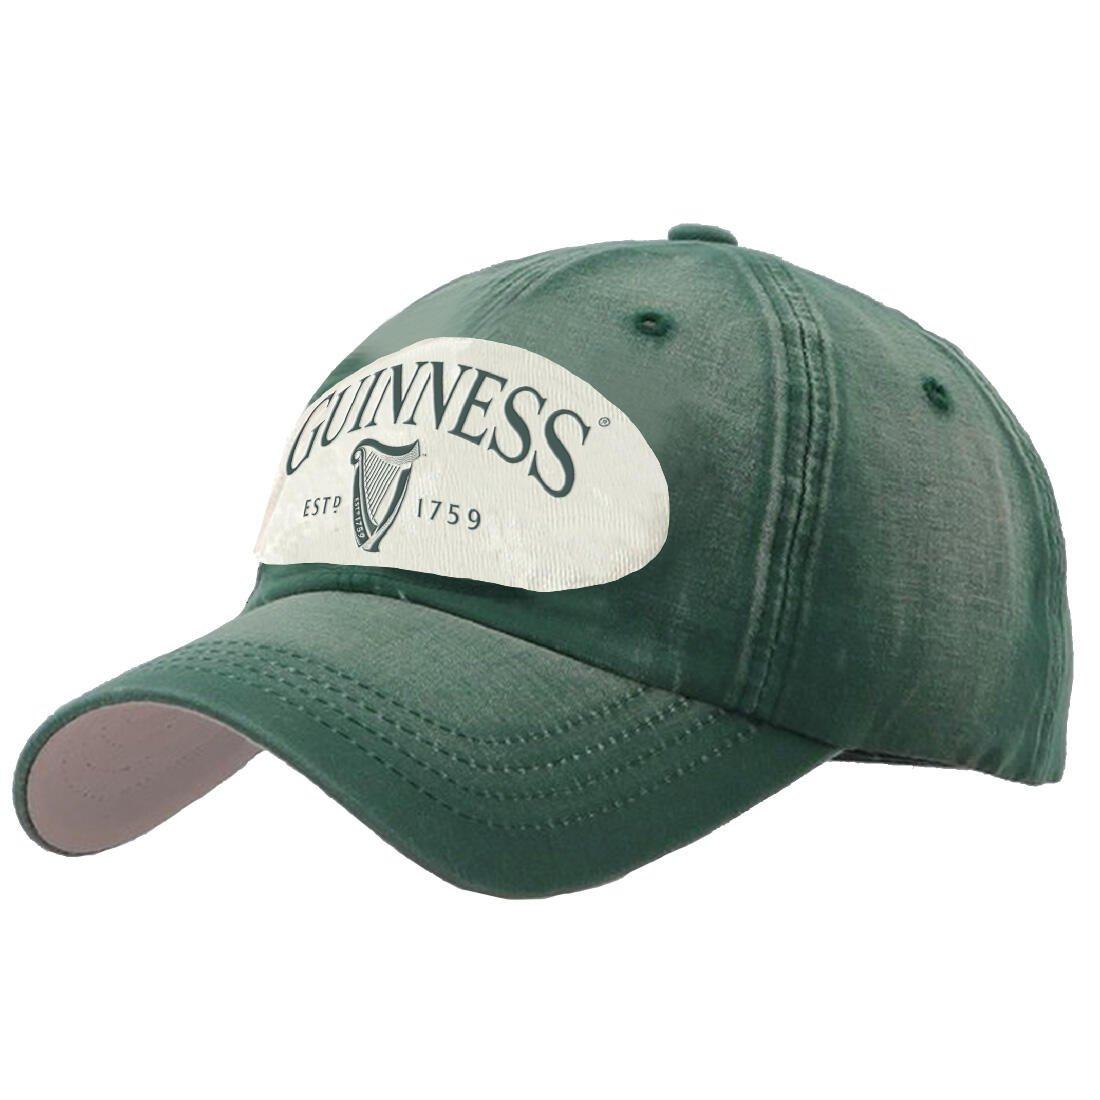 Cappellino Guinness verde - Viaggiare in Irlanda